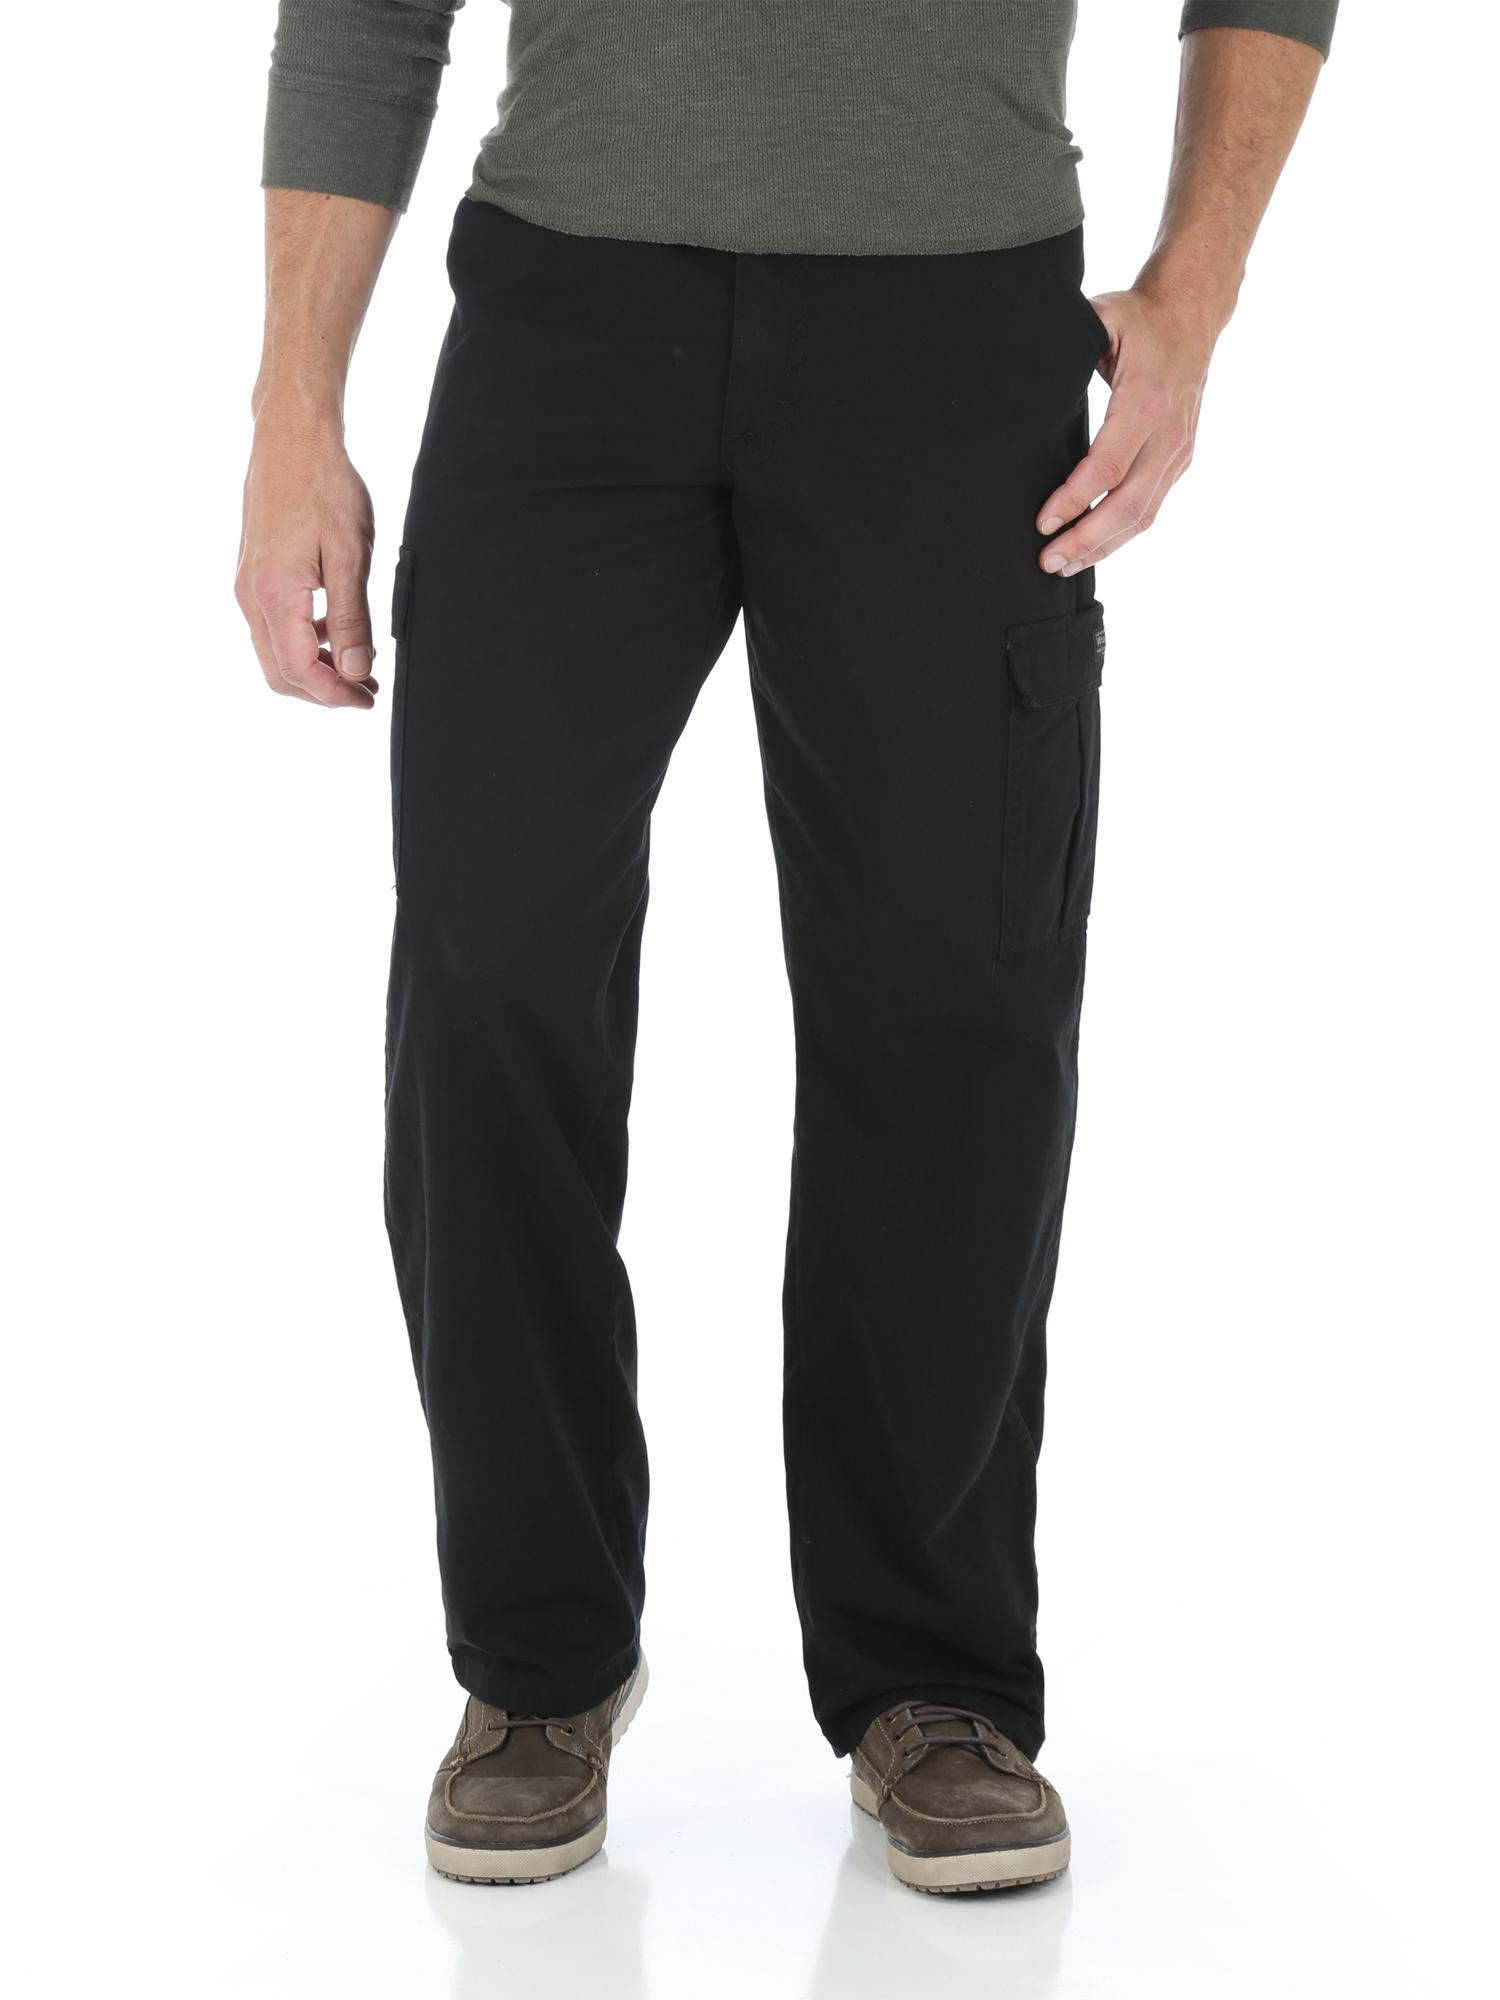 Wrangler - Tall Men's Legacy Cargo Pants - Walmart.com